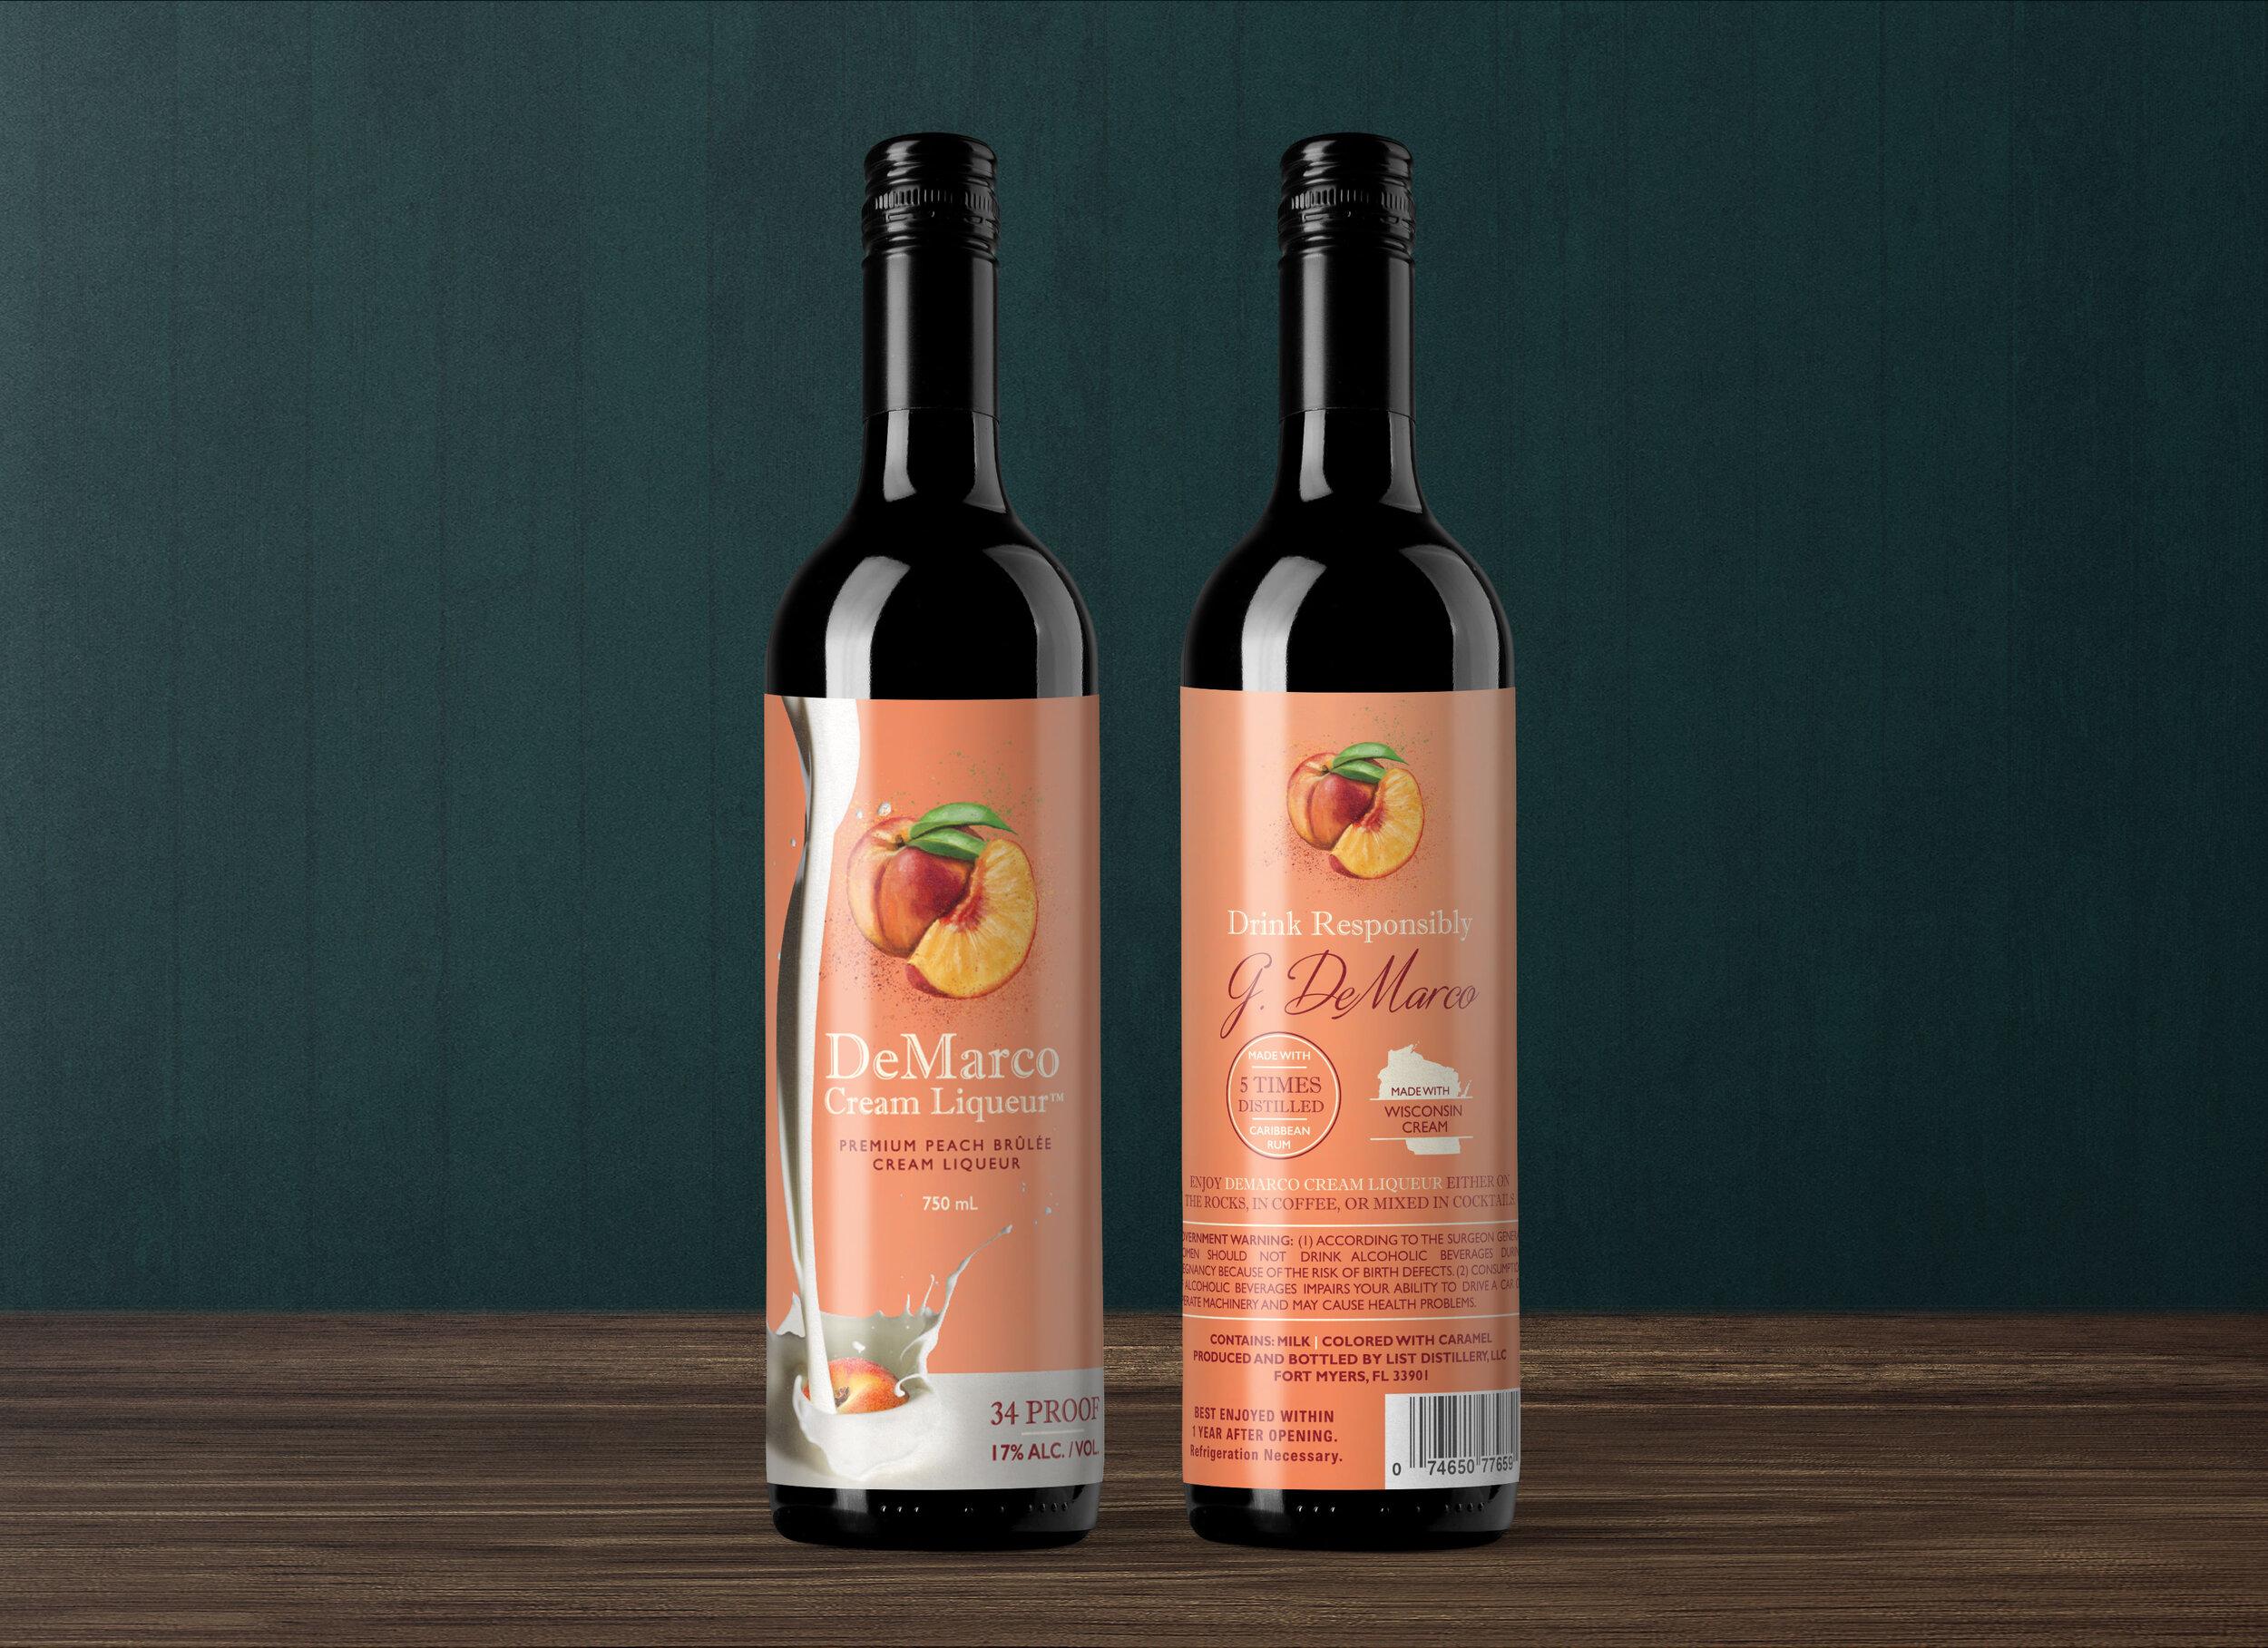 Peach-Bottle-Mockup-2.jpg